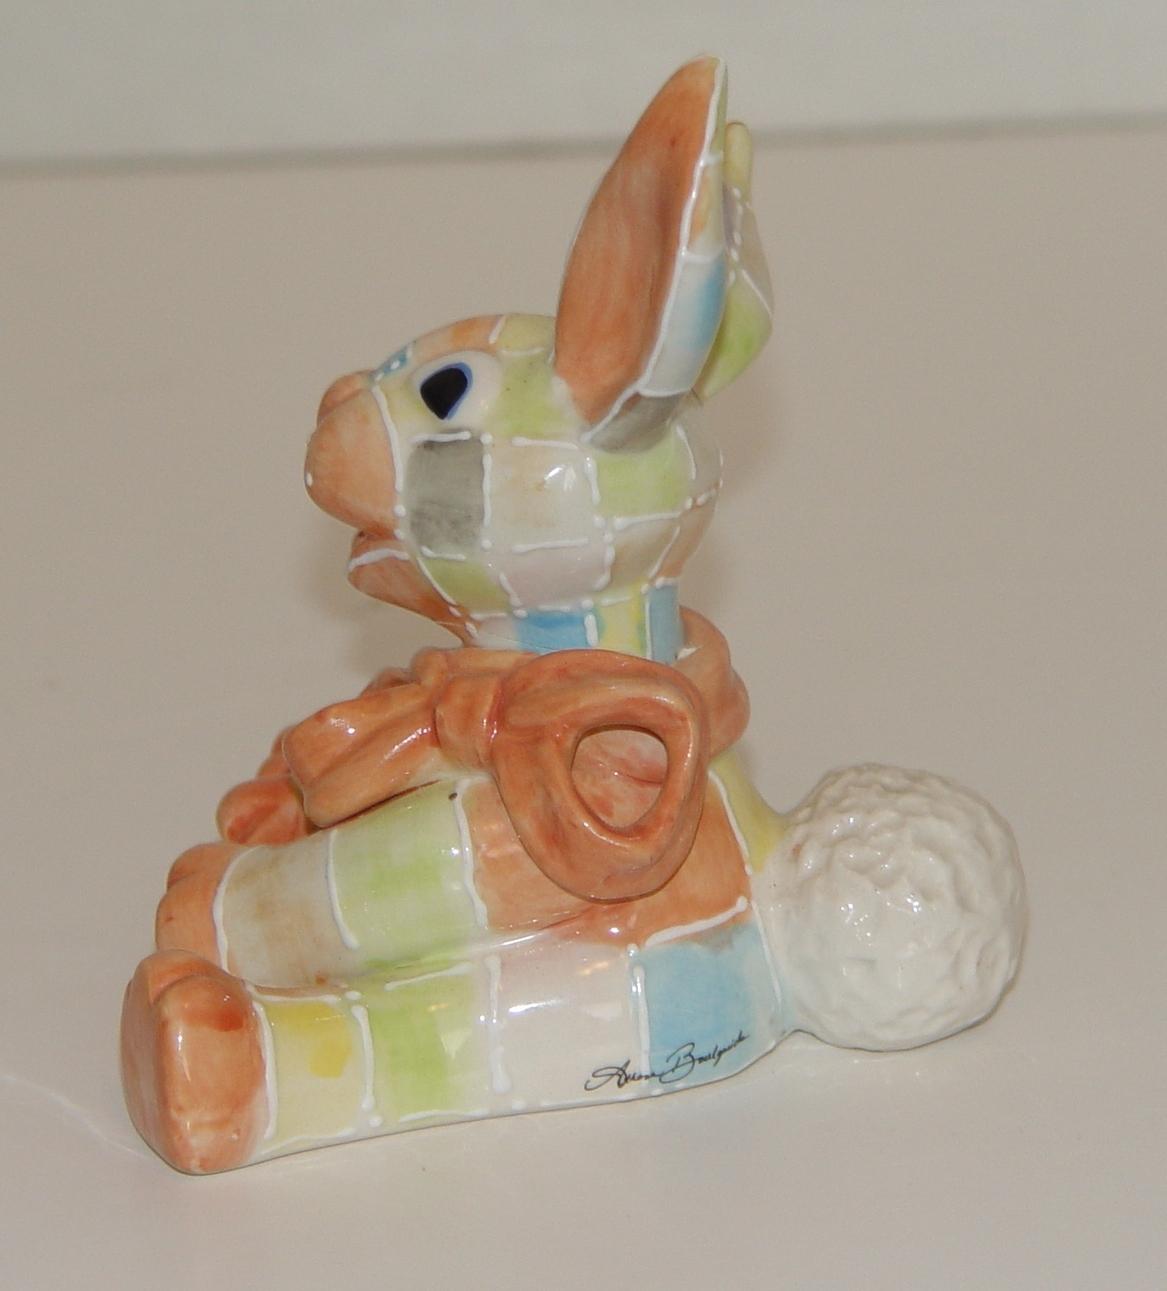 KOKO ORIGINALS Ceramic Patchwork Rabbit  Figurine : 3  1/2 in. Tall Signed